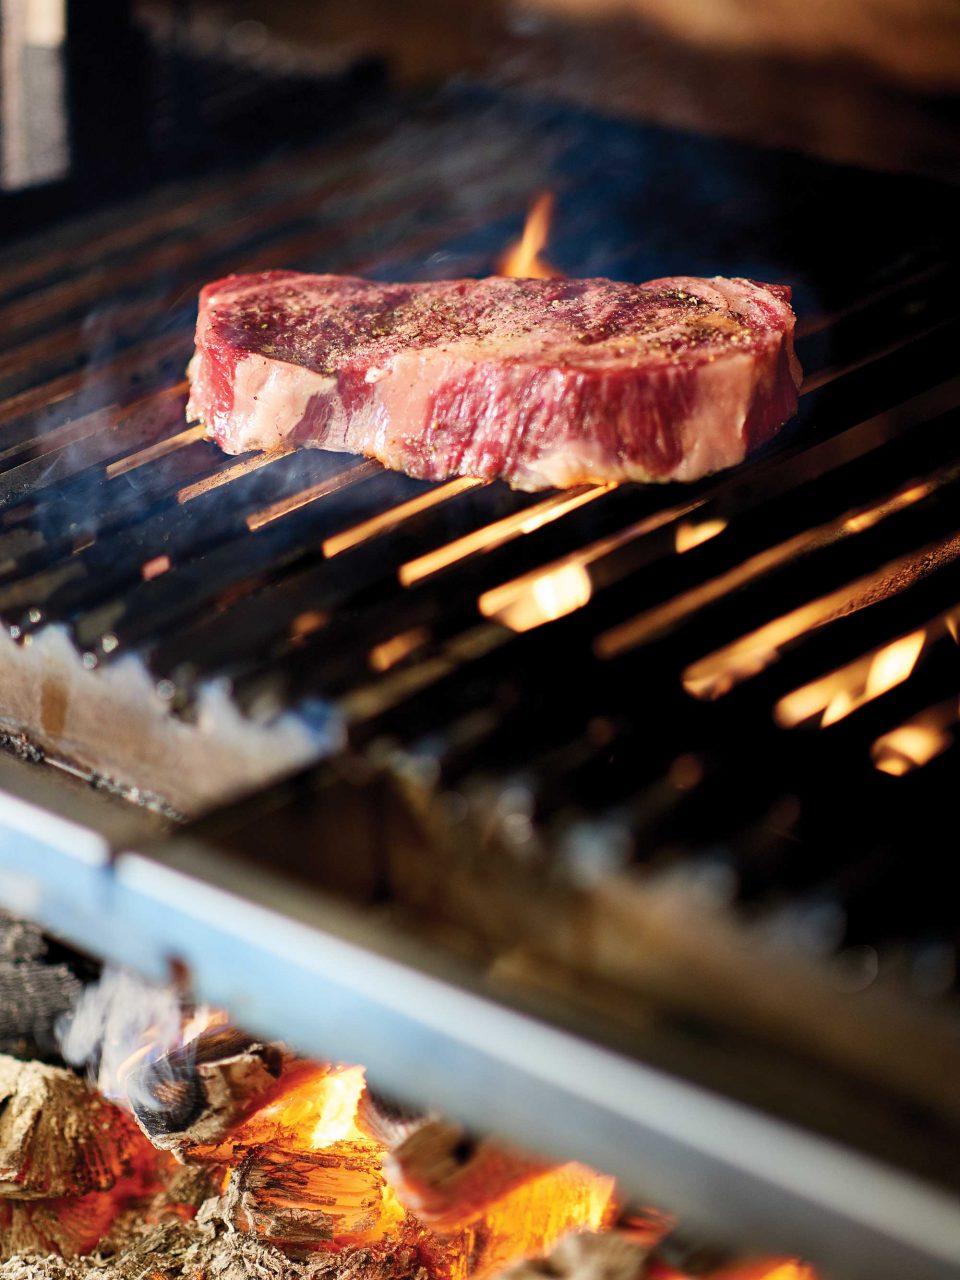 0708-grillres1-5-960x1280.jpg